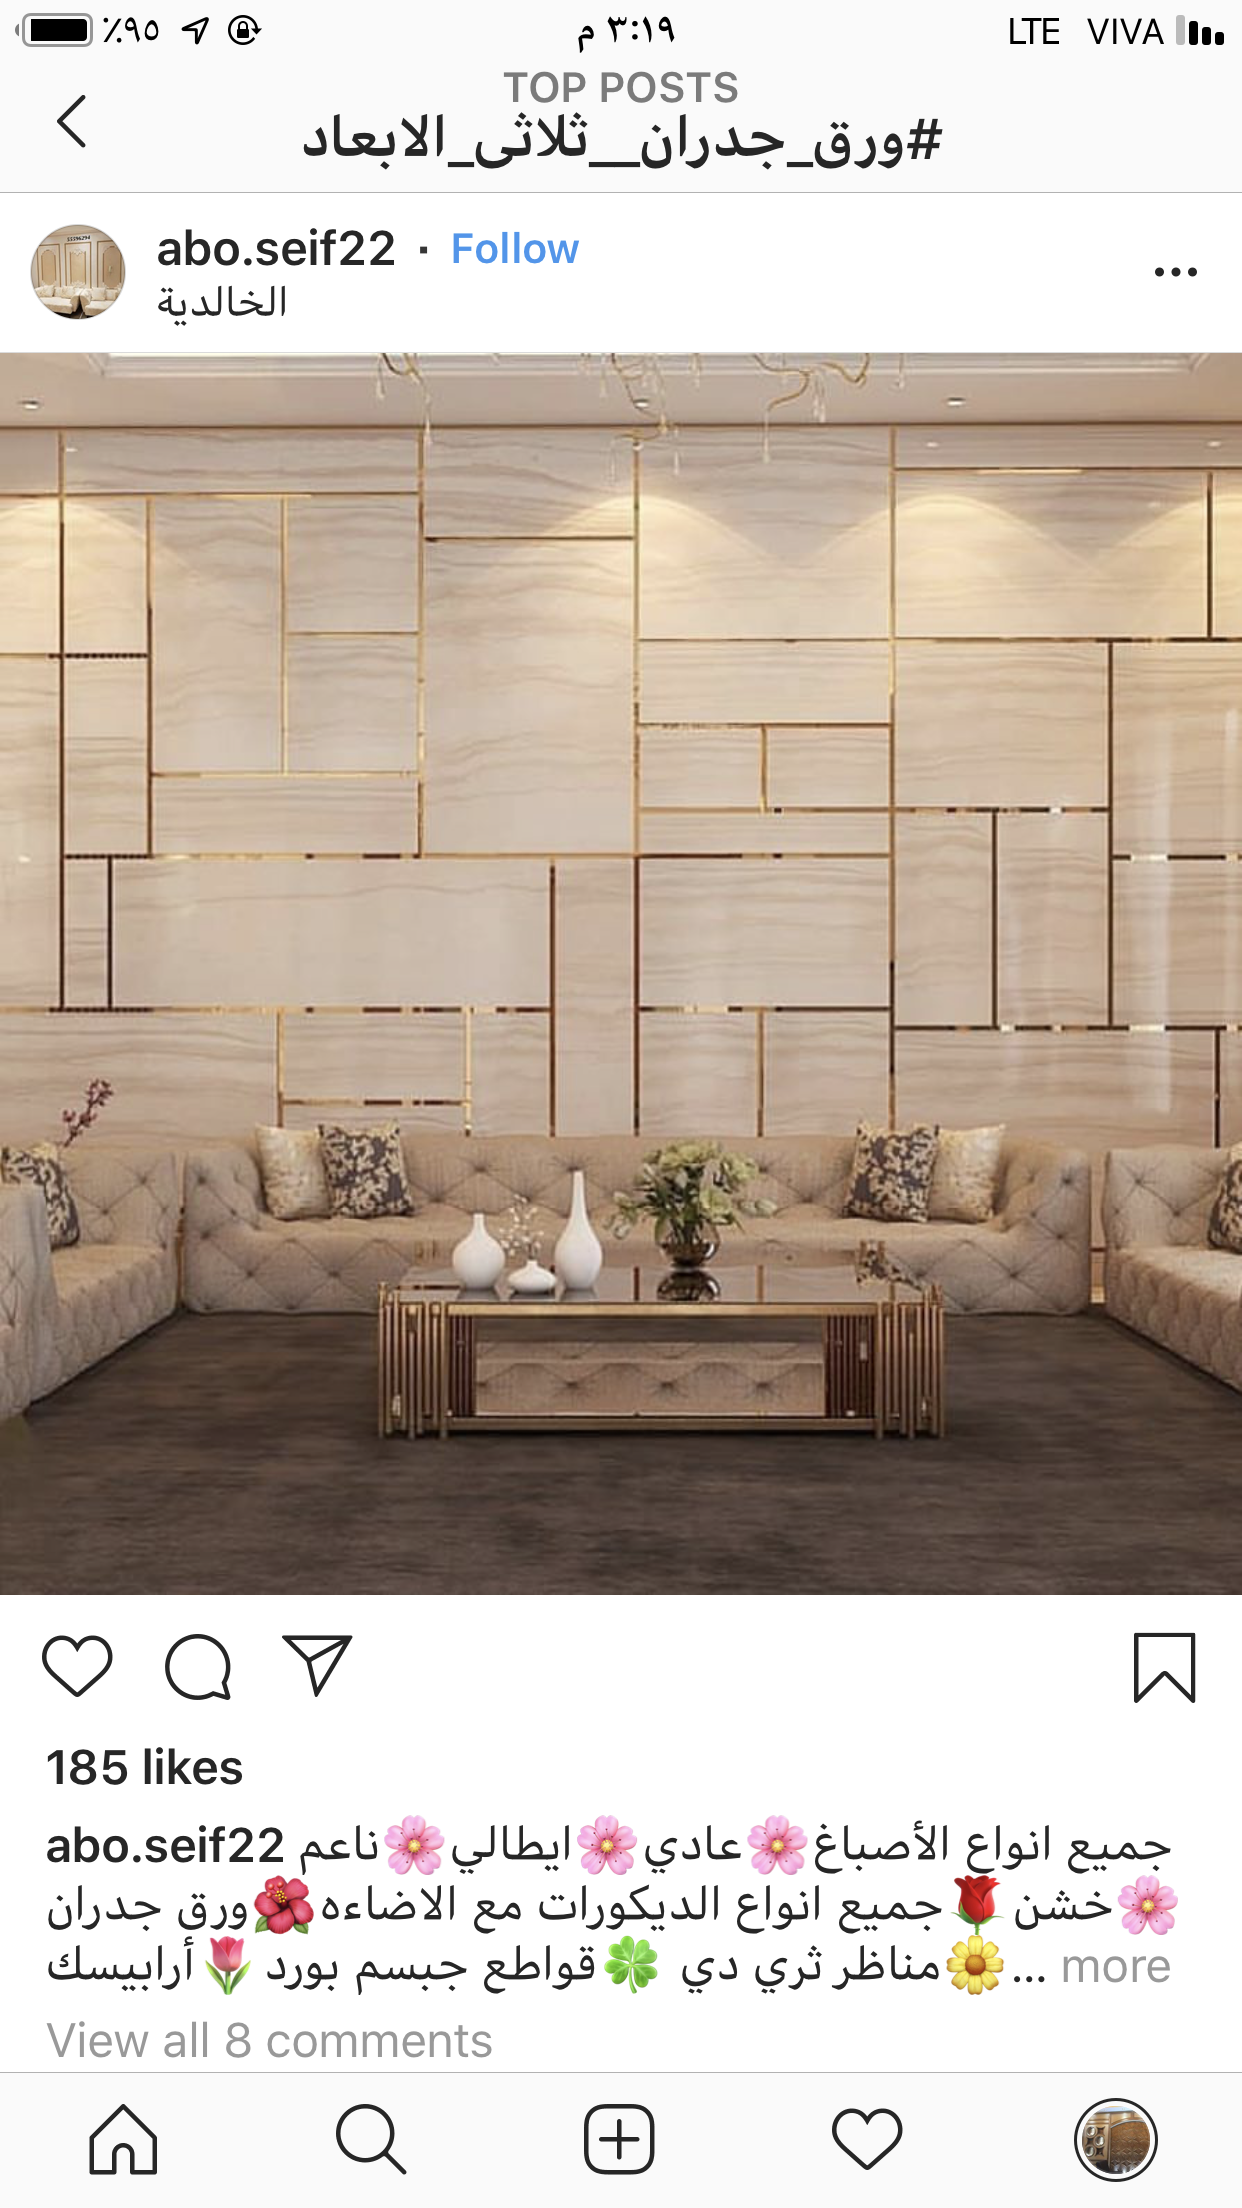 اصباغ وديكورات كل ماهو جديد في عالم الاصباغ ساده ايطالي صبغ لكر ناري ورق جدران بديل الر Luxury Dining Room Tables Home Room Design Home Design Floor Plans